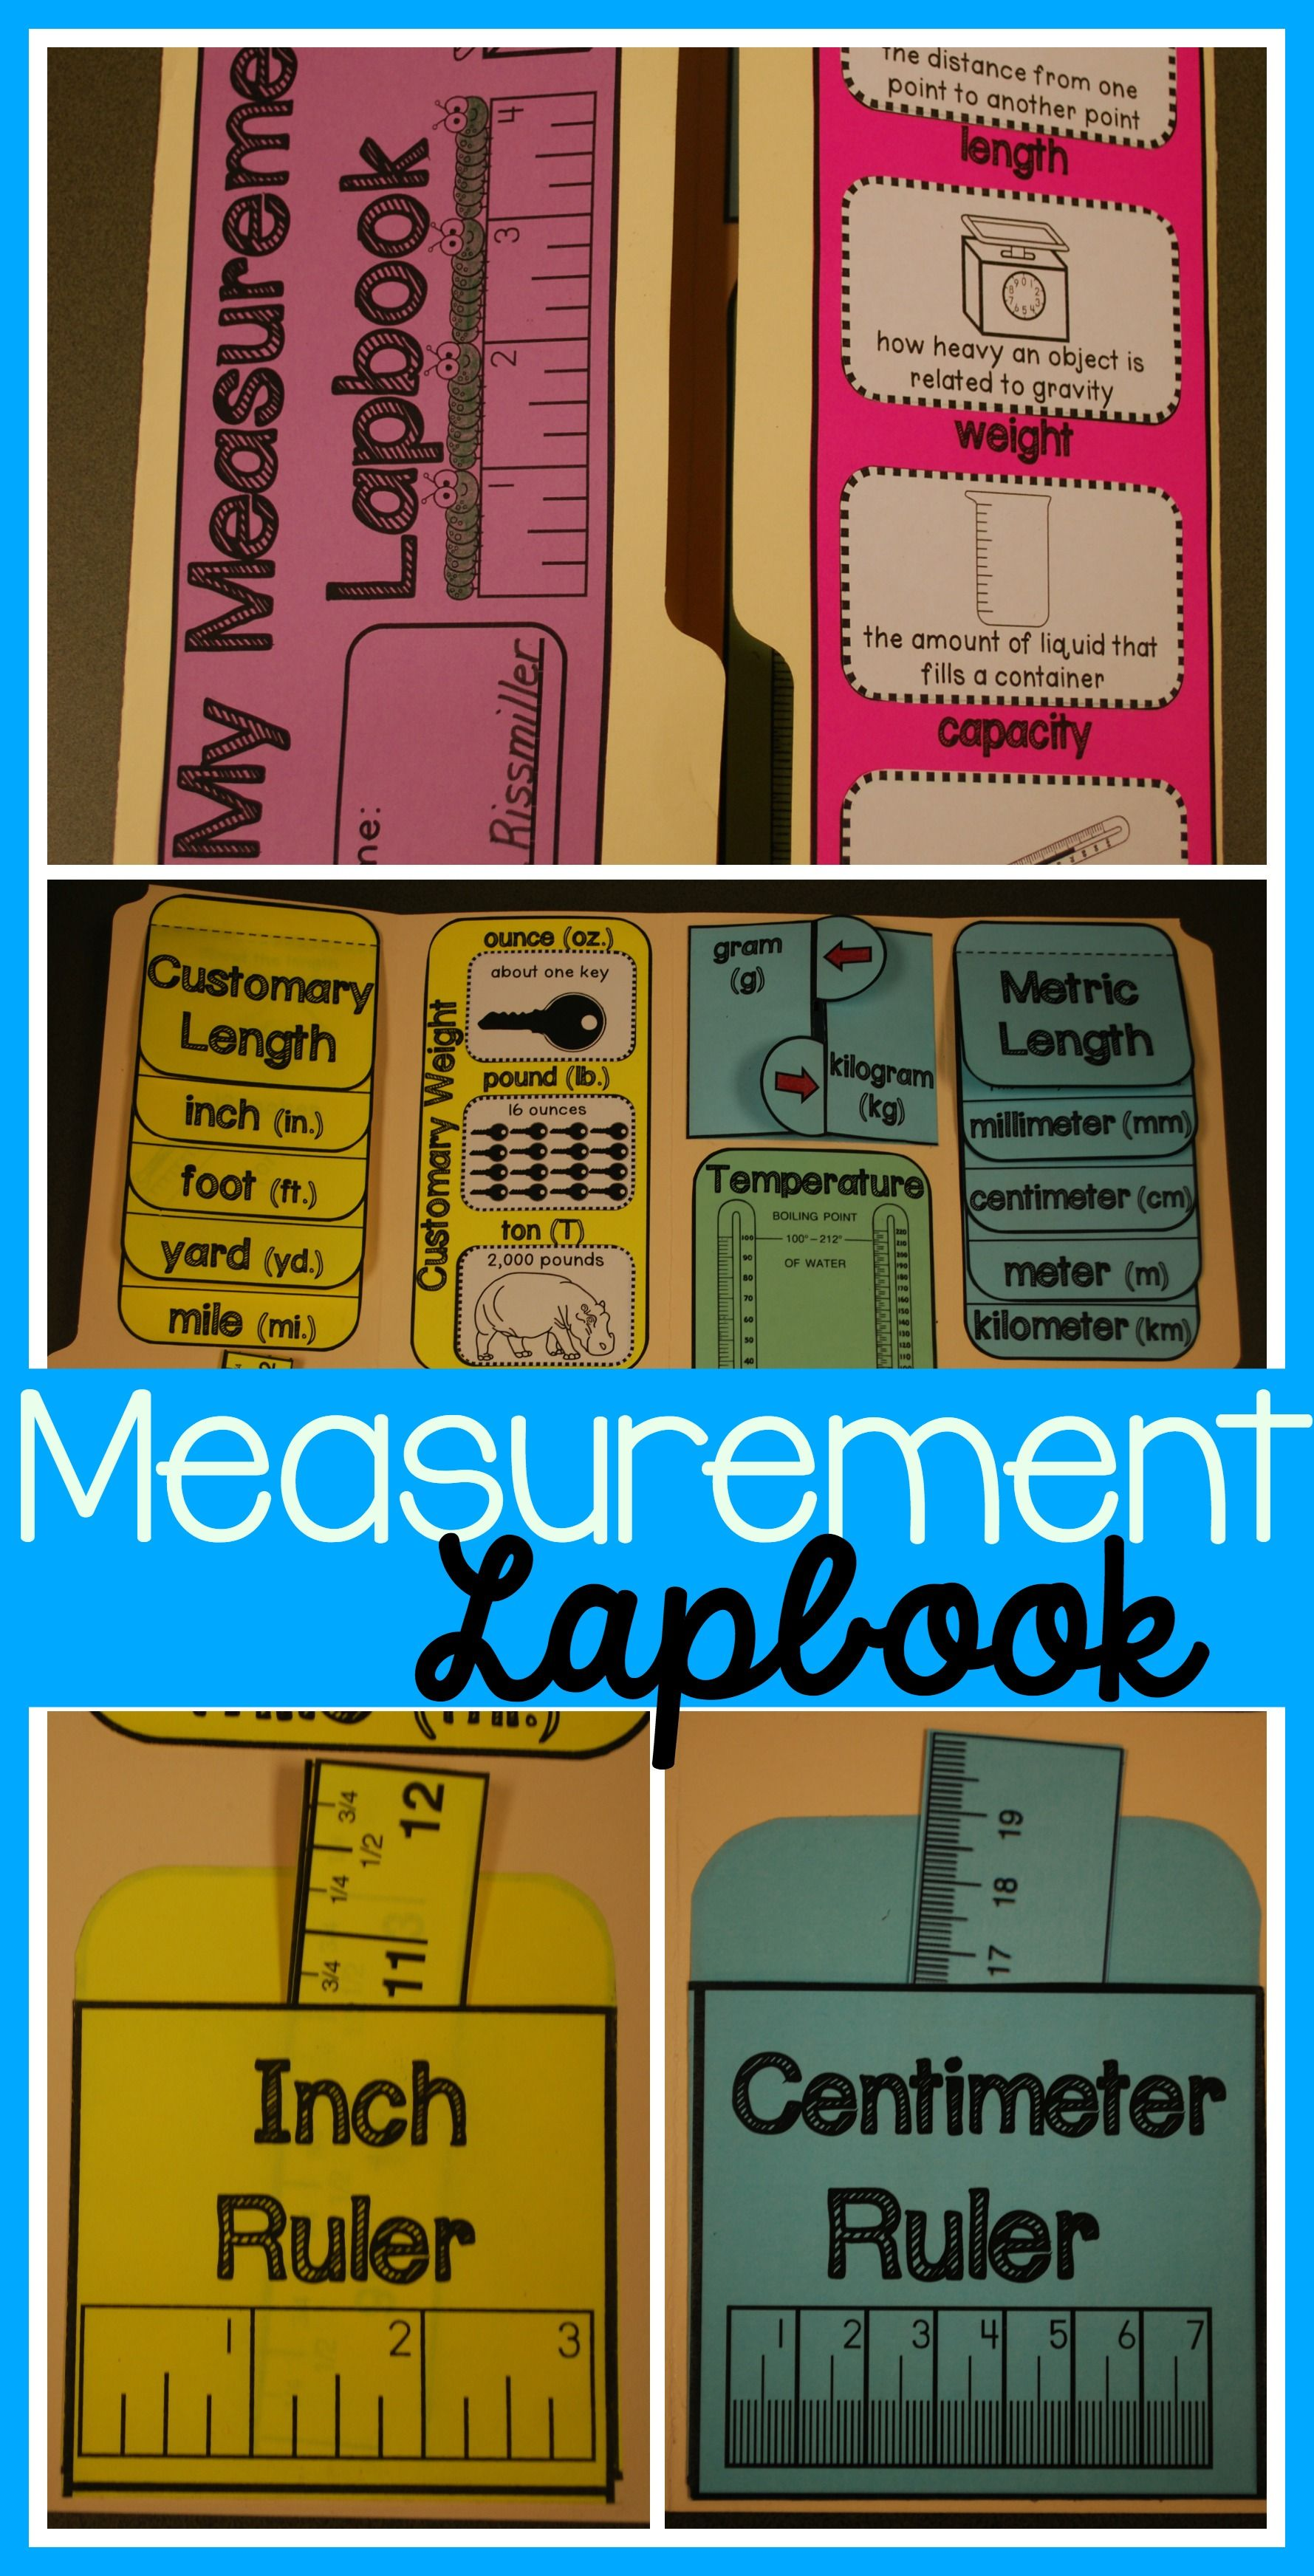 Measurement Lapbook Interactive Kit Customary Amp Metric